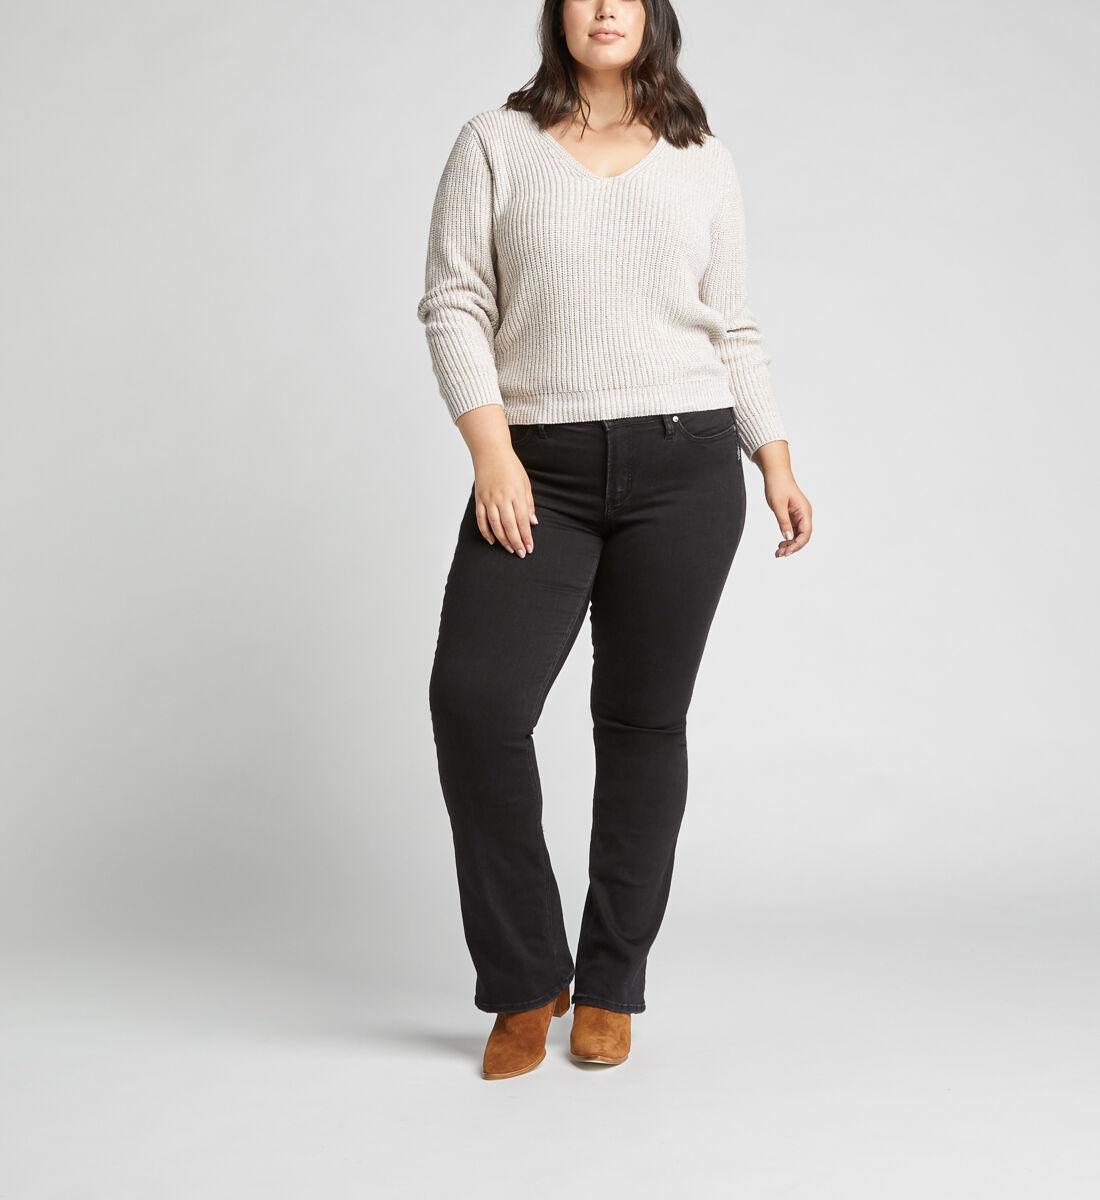 Suki Mid Rise Slim Bootcut Jeans Plus Size,Black Front